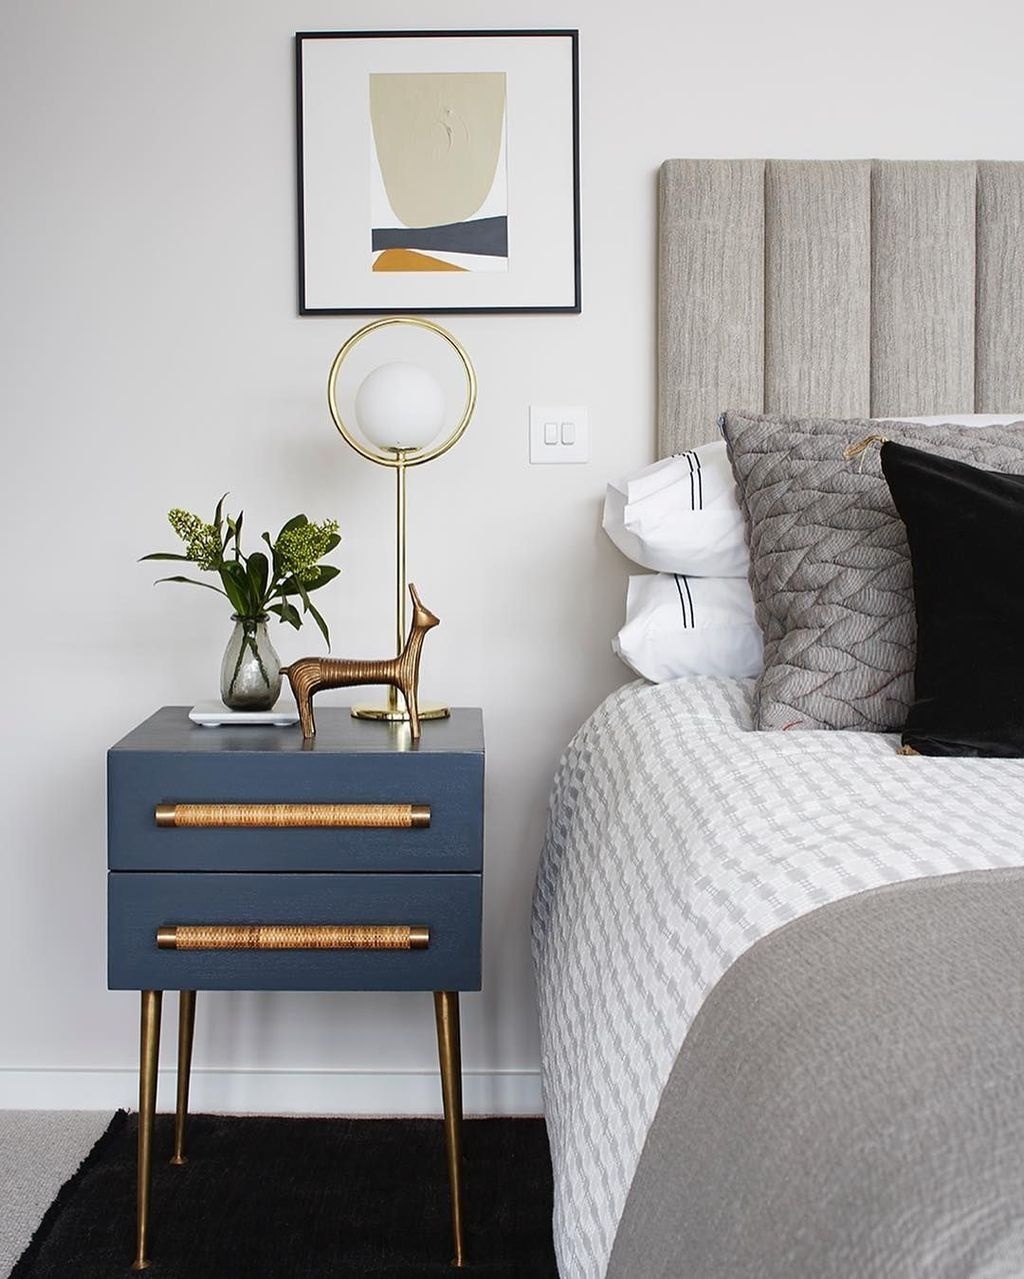 20 Bedroom Chandelier Designs Decorating Ideas: 30+ Pretty Chandelier Lamp Design Ideas For Your Bedroom